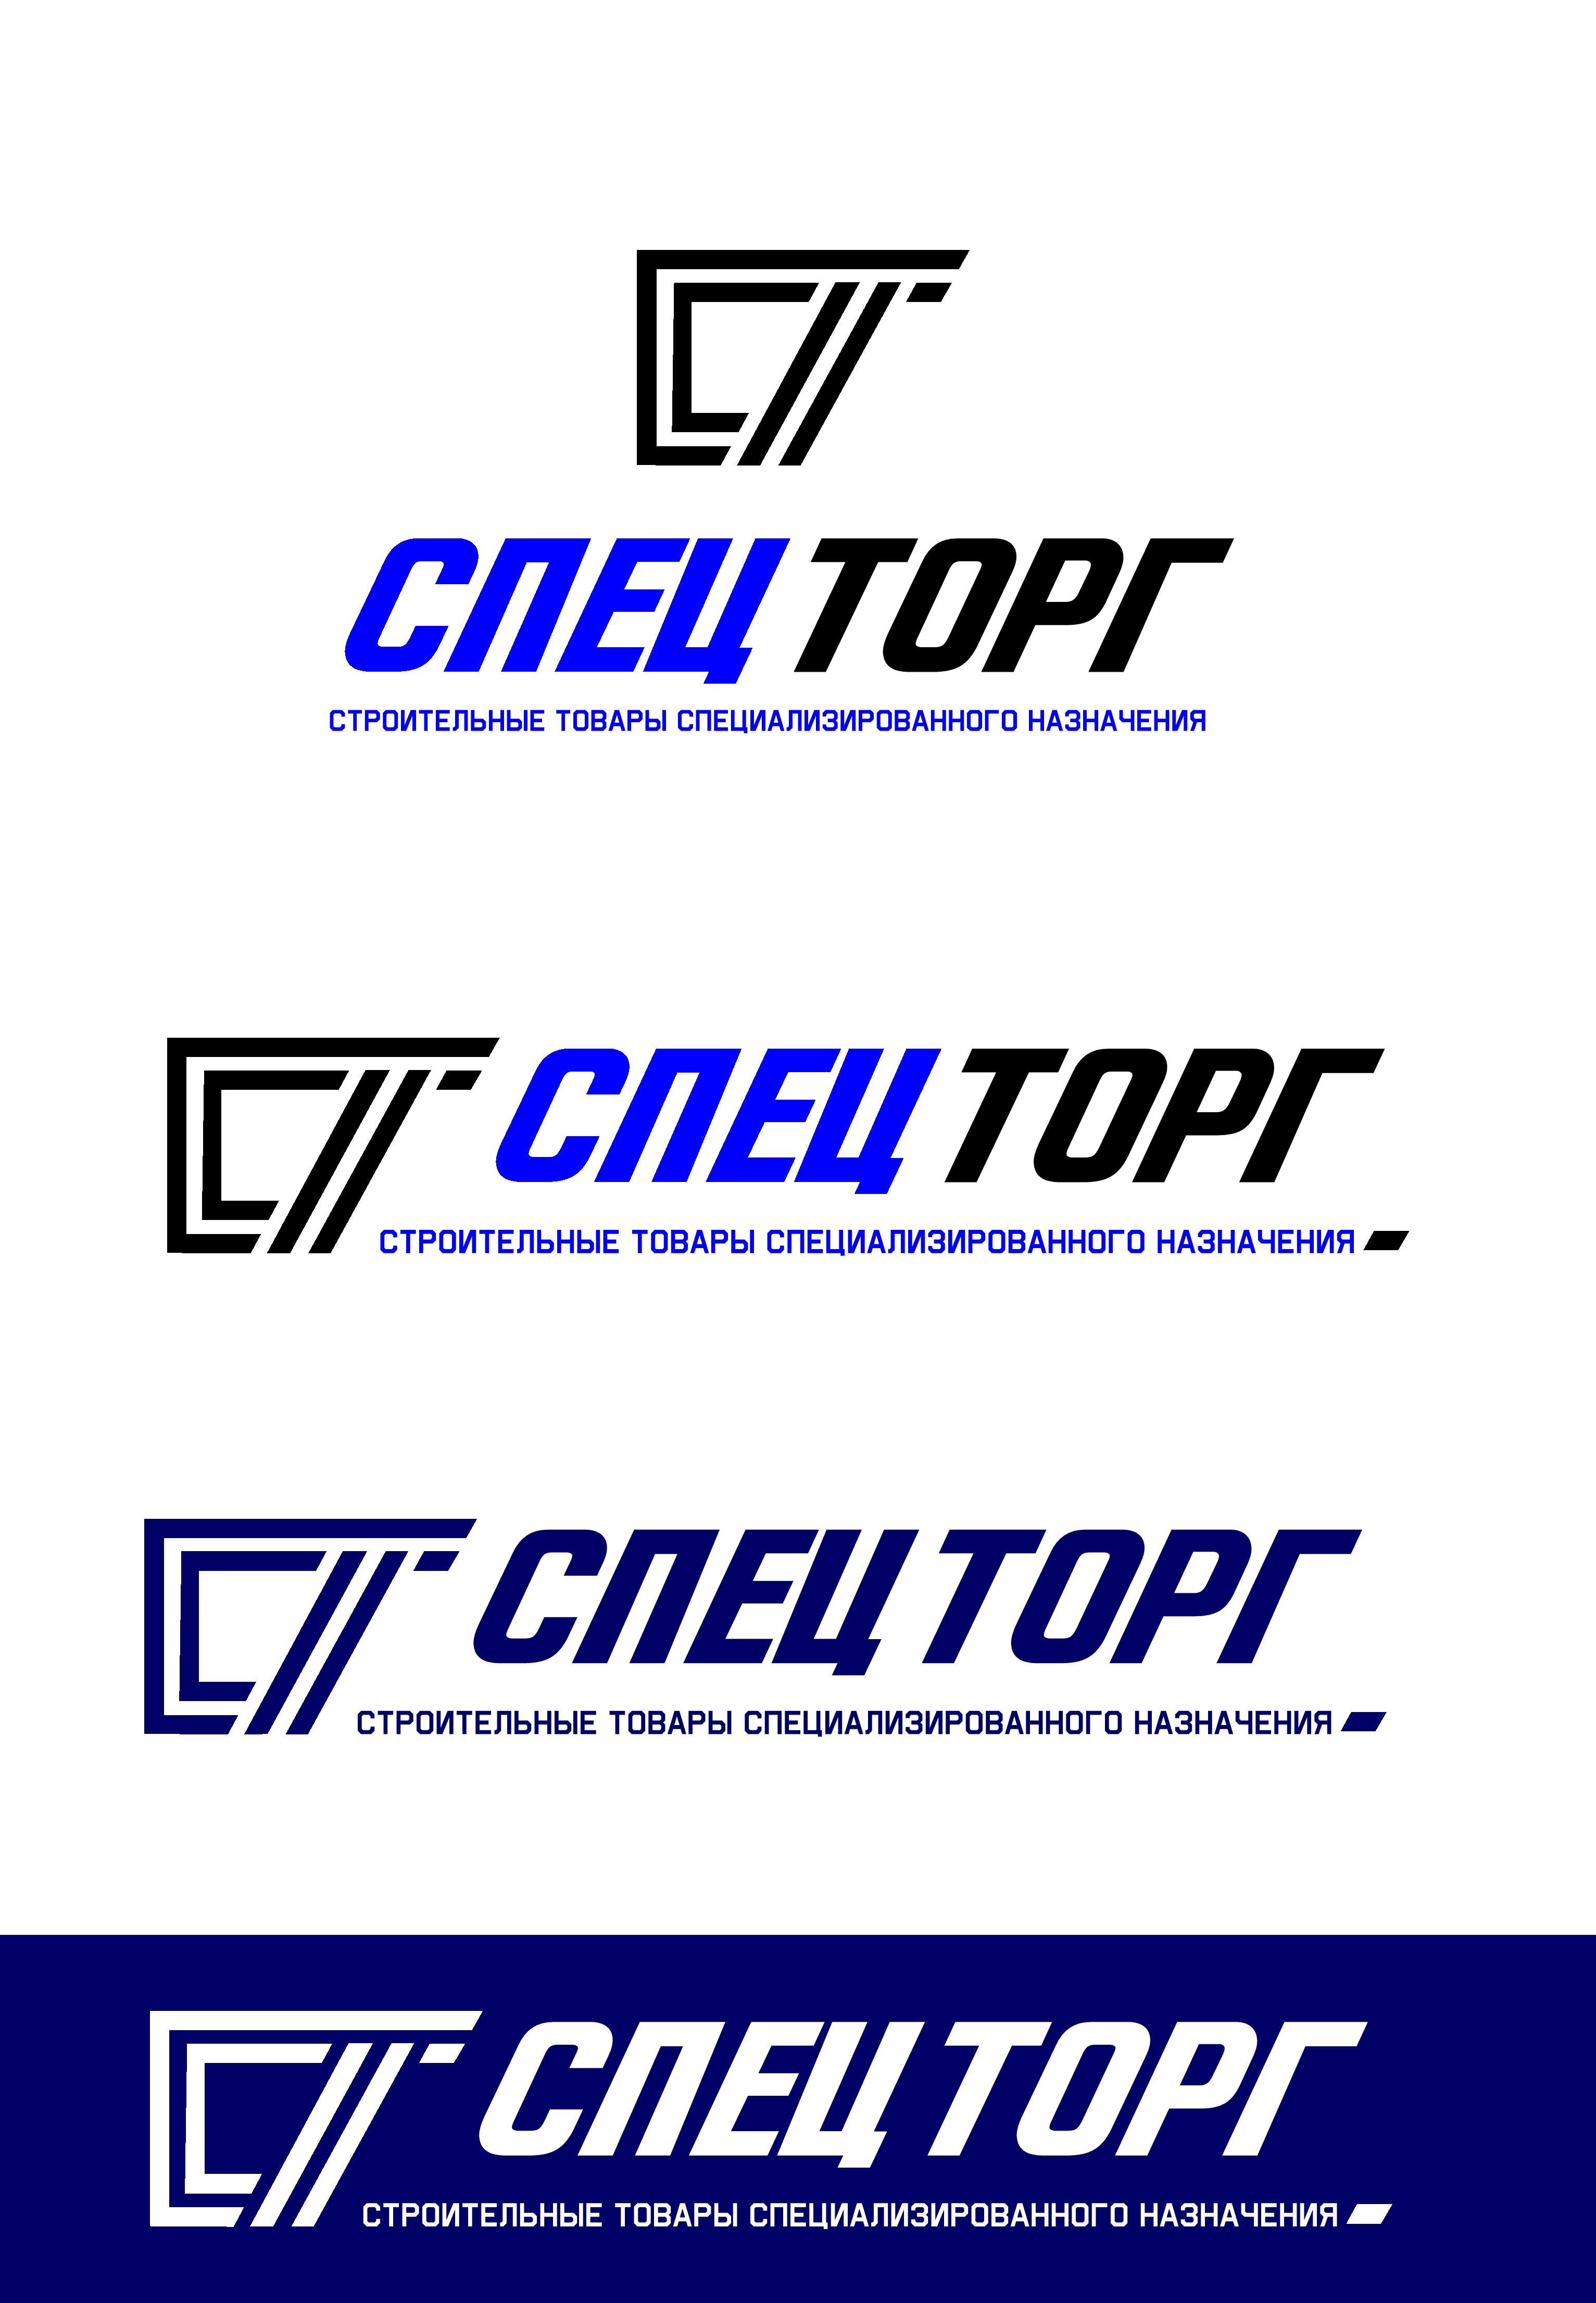 Разработать дизайн  логотипа компании фото f_3445dc51719e1812.jpg